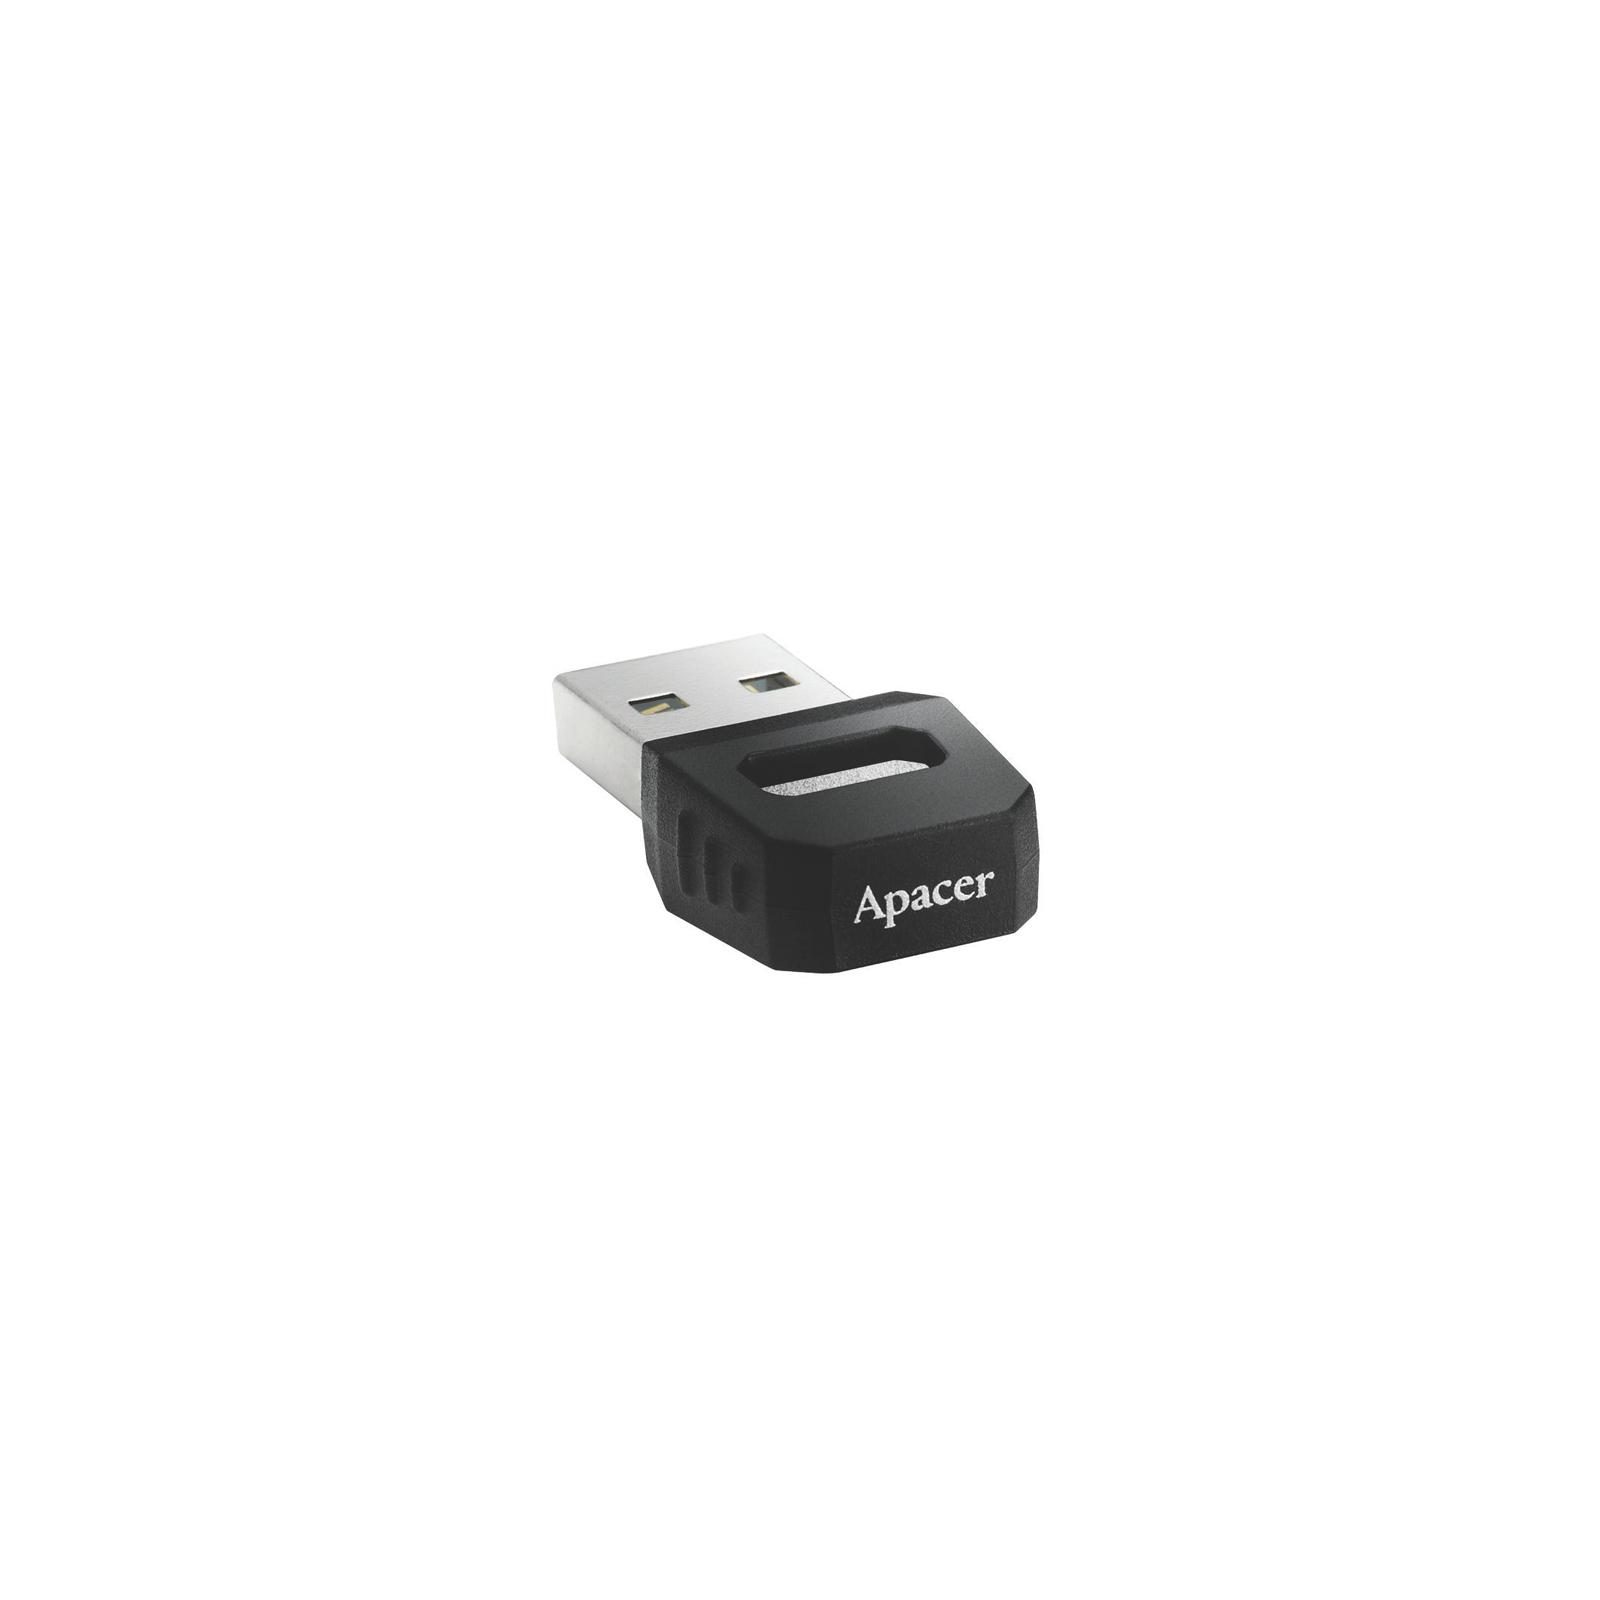 USB флеш накопитель 8GB AH134 Black RP USB2.0 Apacer (AP8GAH134B-1) изображение 2